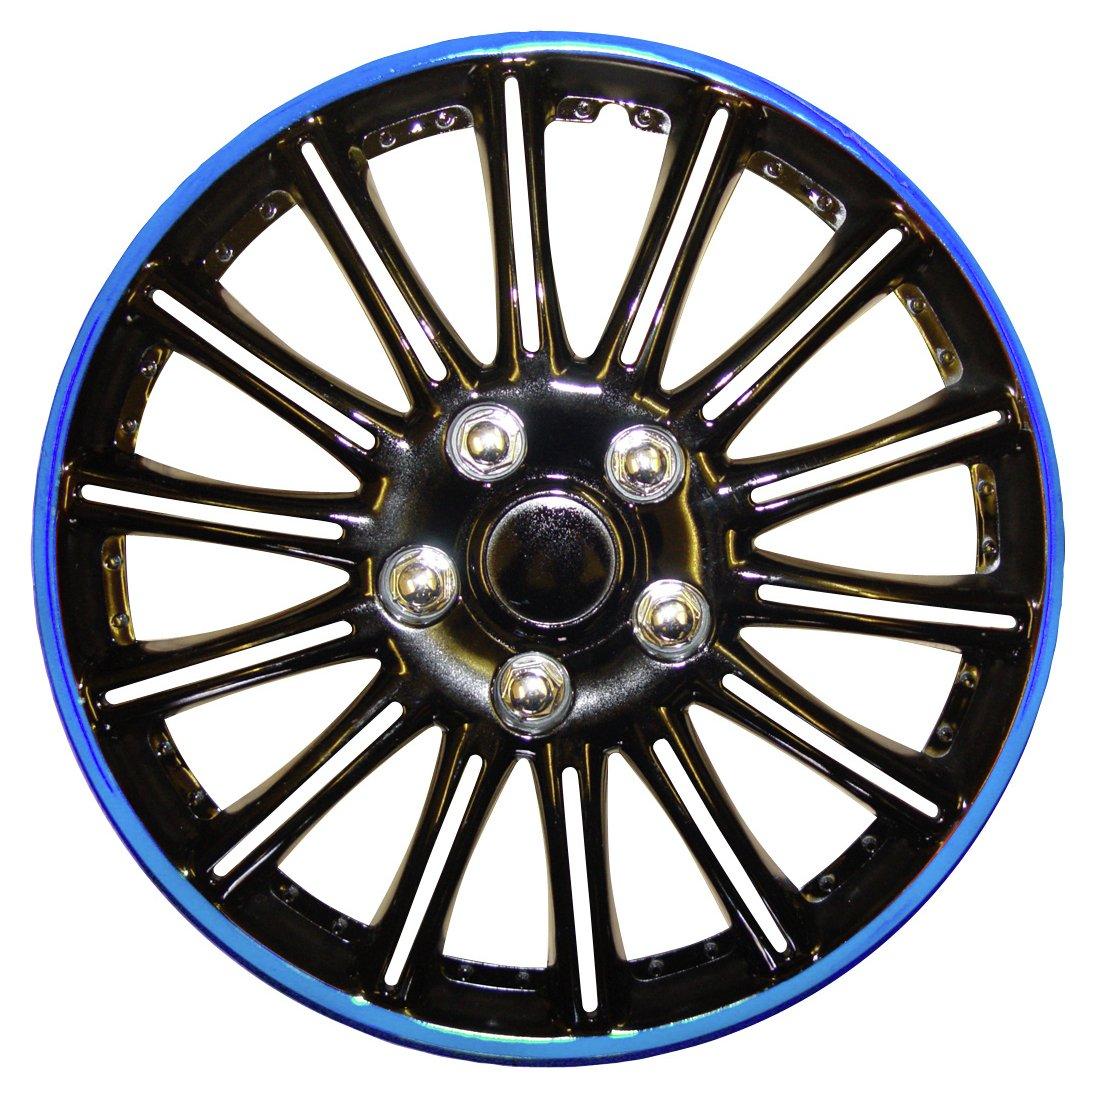 Rezistanz 14 Inch Wheel Trims - Black and Blue